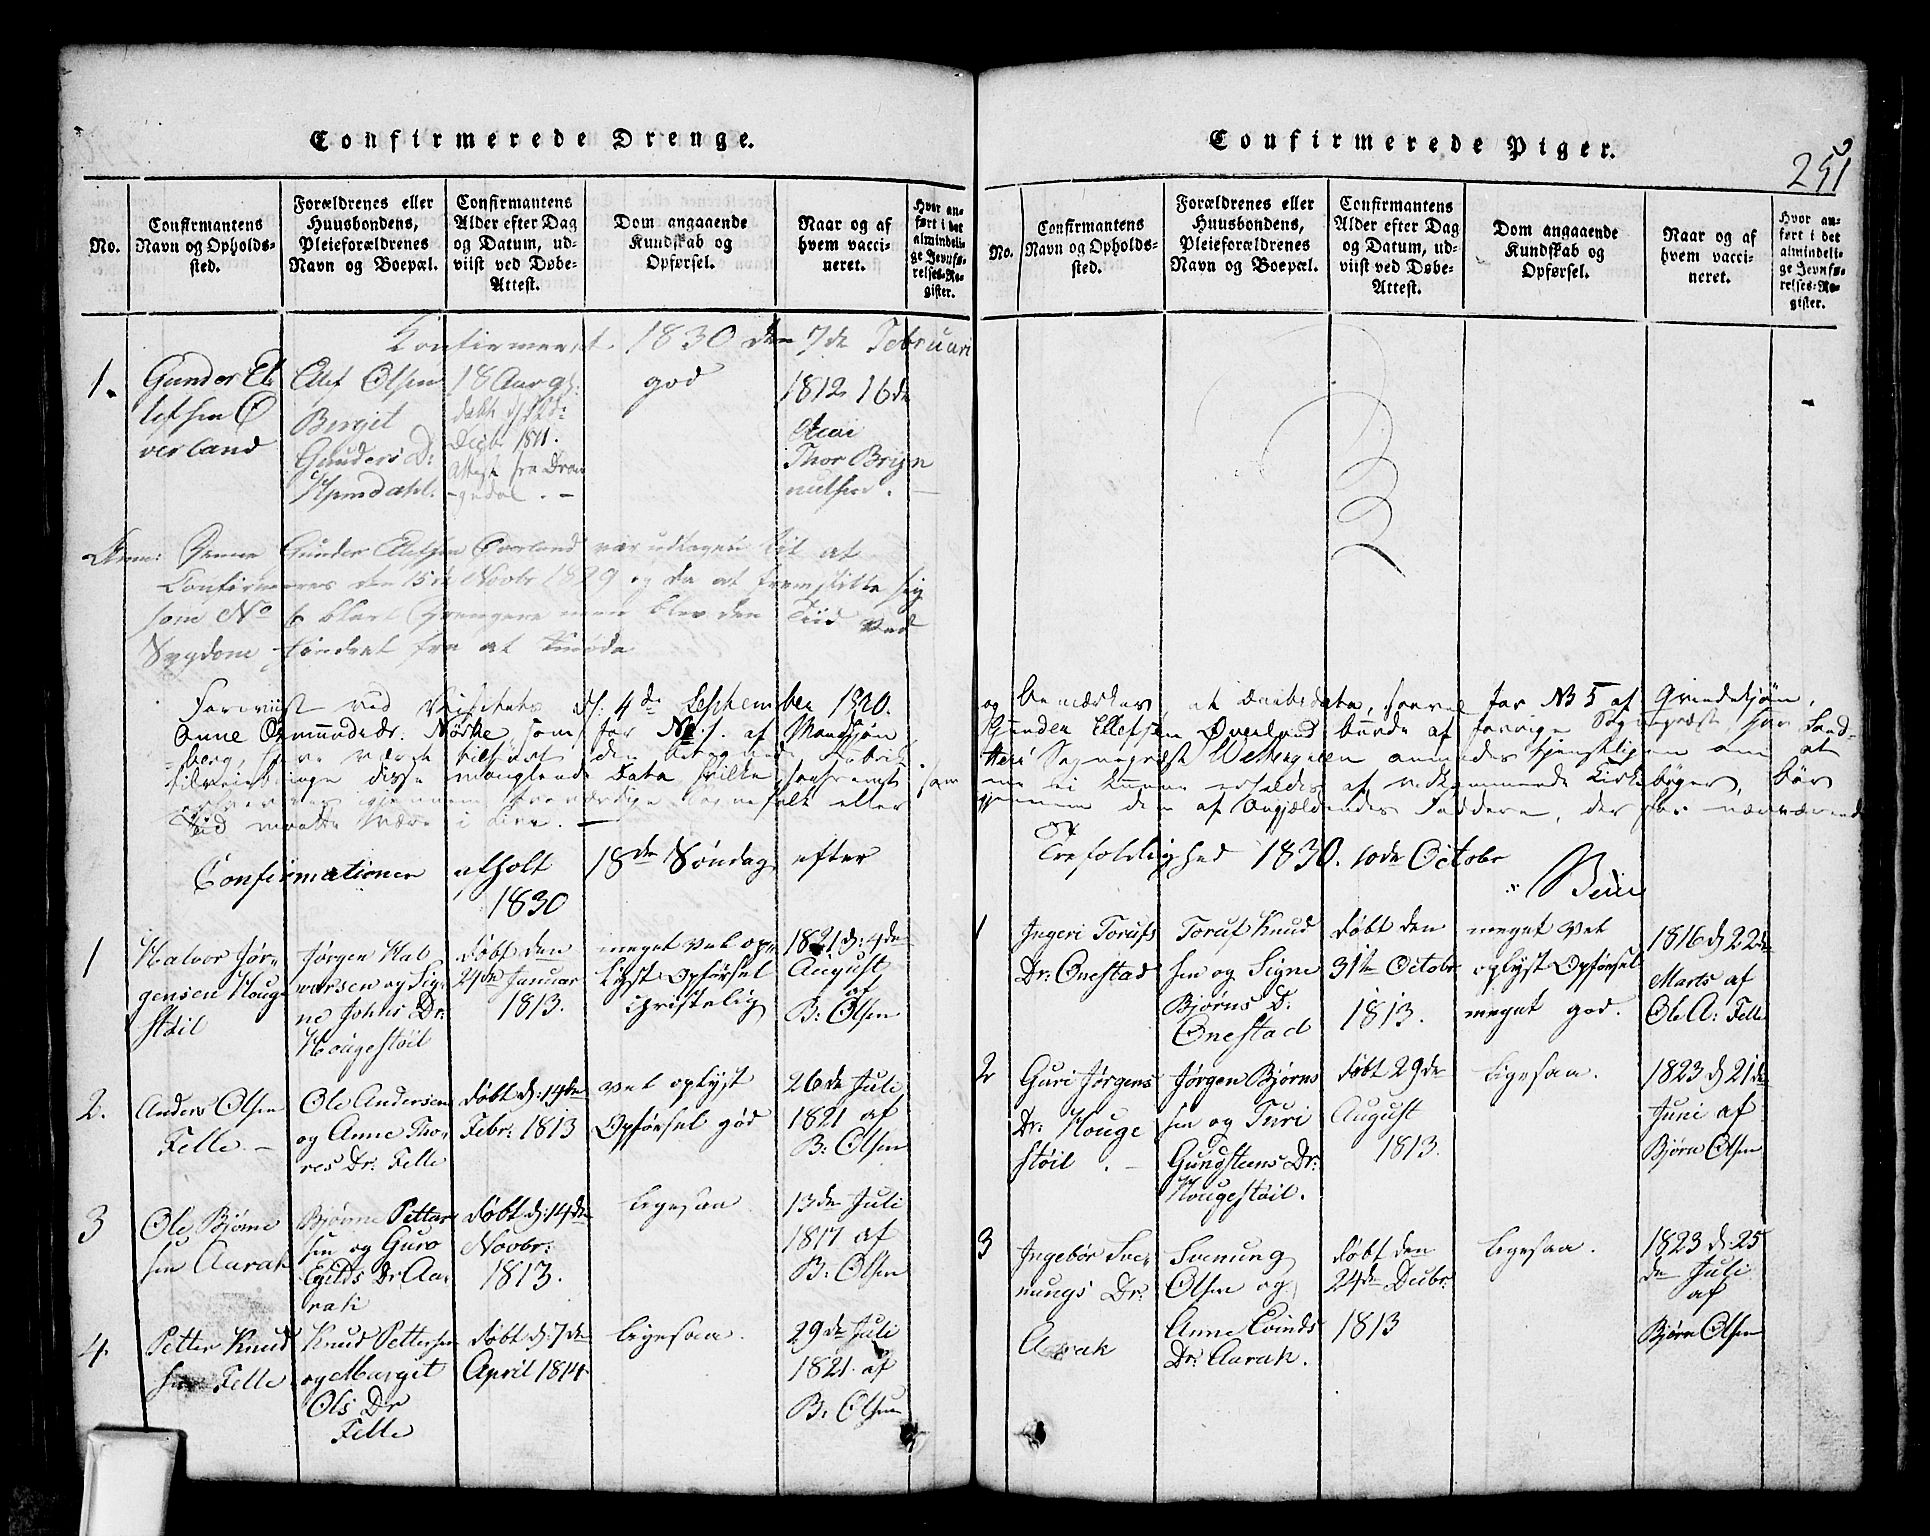 SAKO, Nissedal kirkebøker, G/Gb/L0001: Klokkerbok nr. II 1, 1814-1862, s. 251